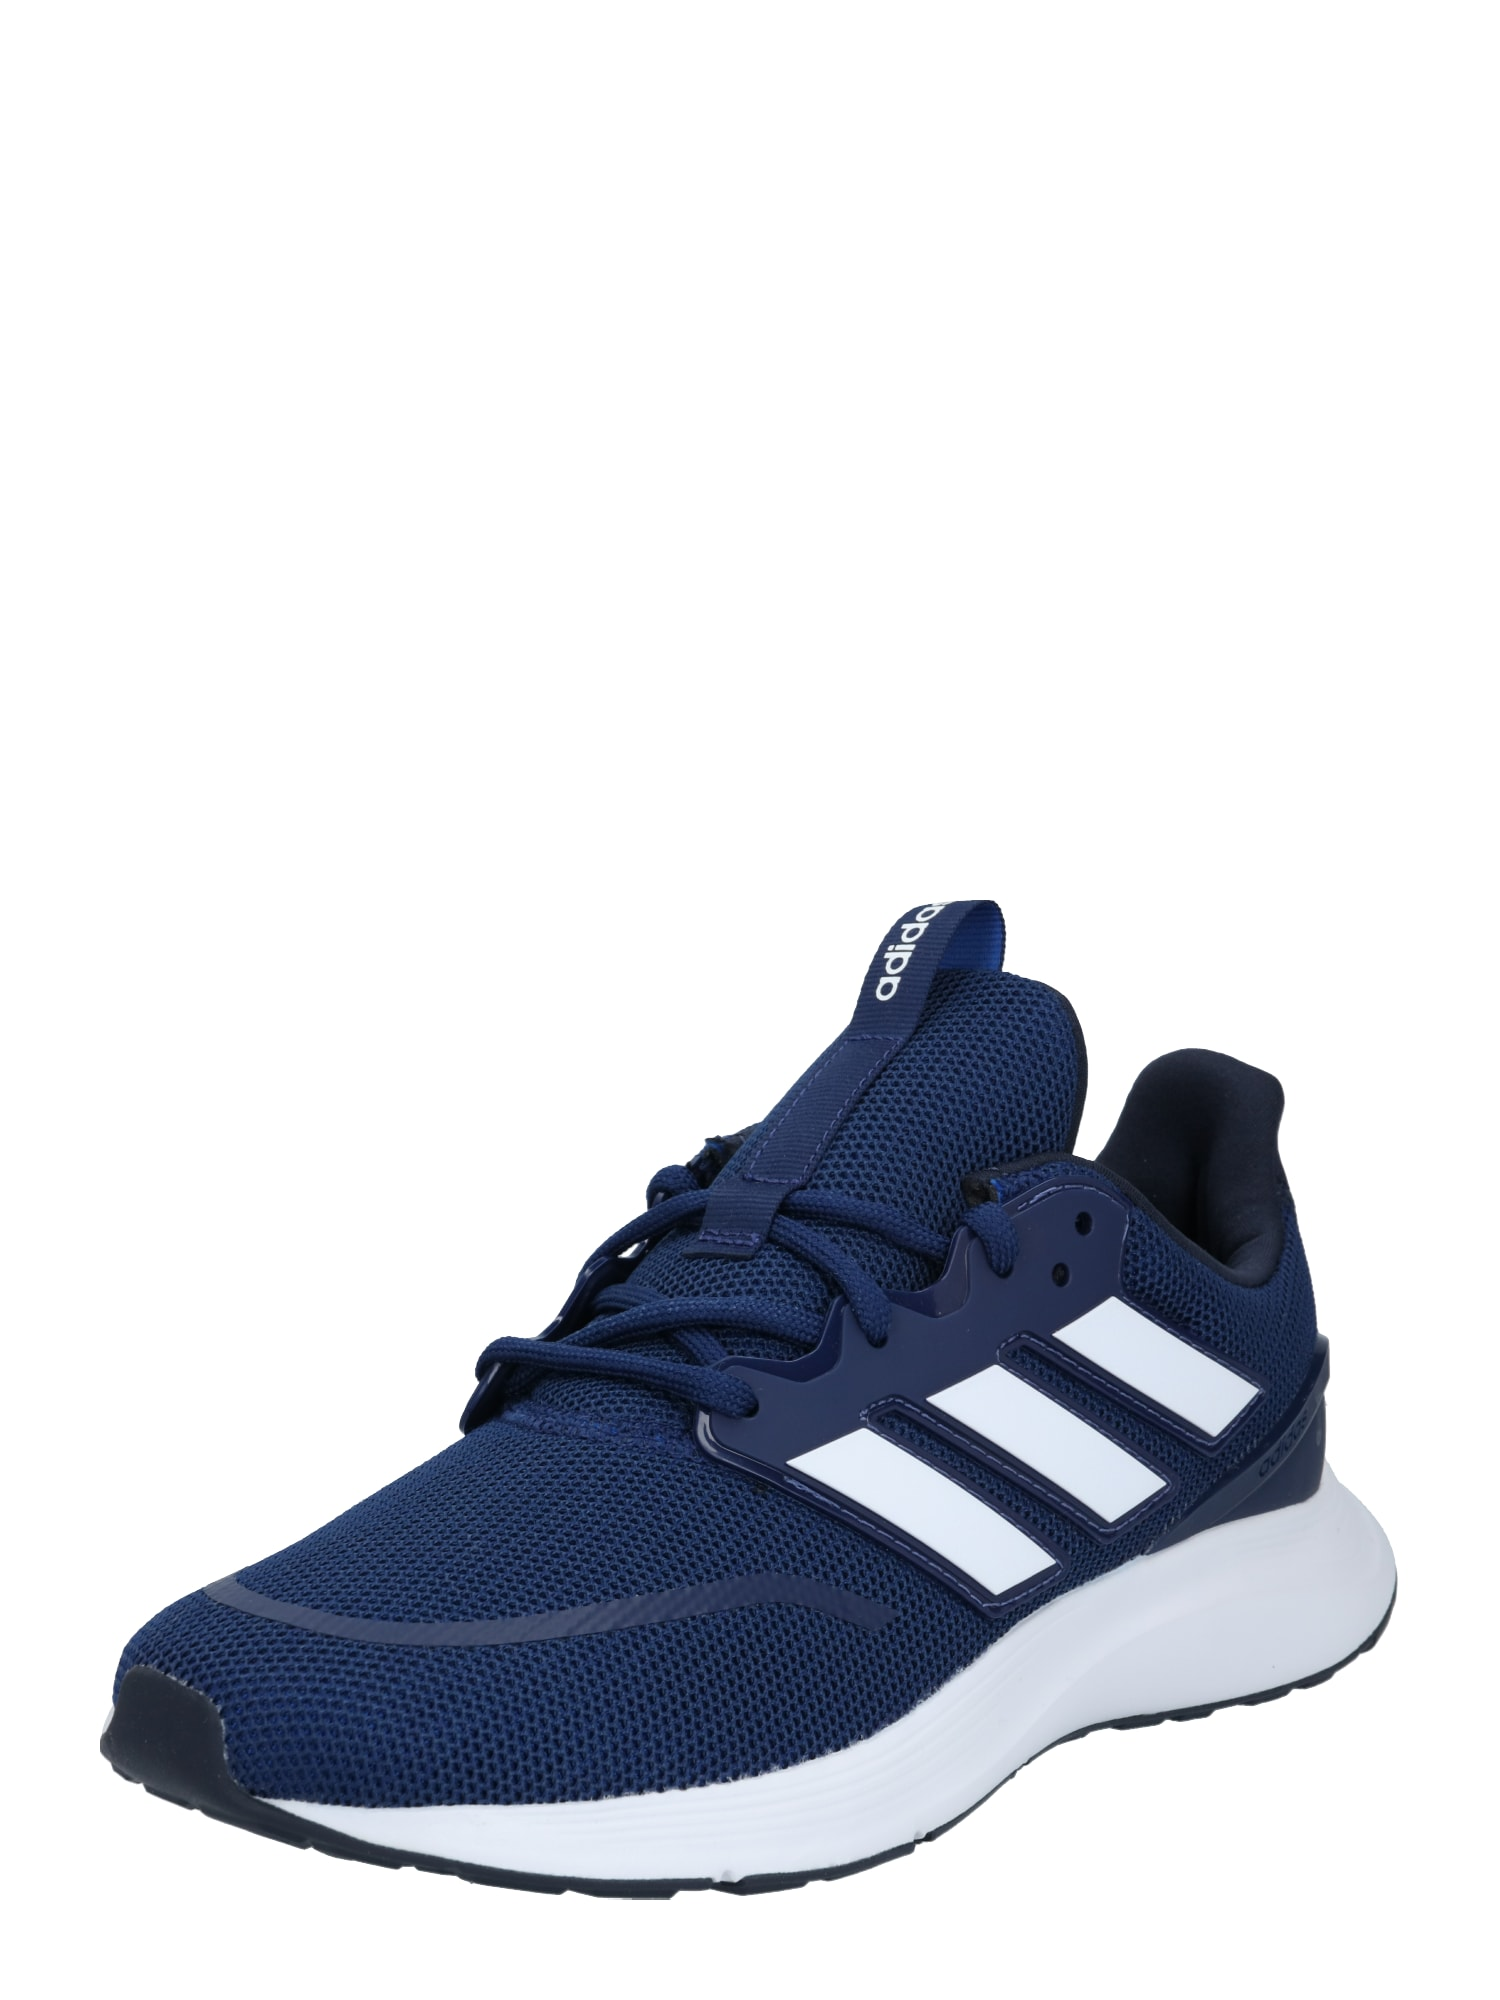 ADIDAS PERFORMANCE Běžecká obuv 'Energyfalcon'  bílá / námořnická modř